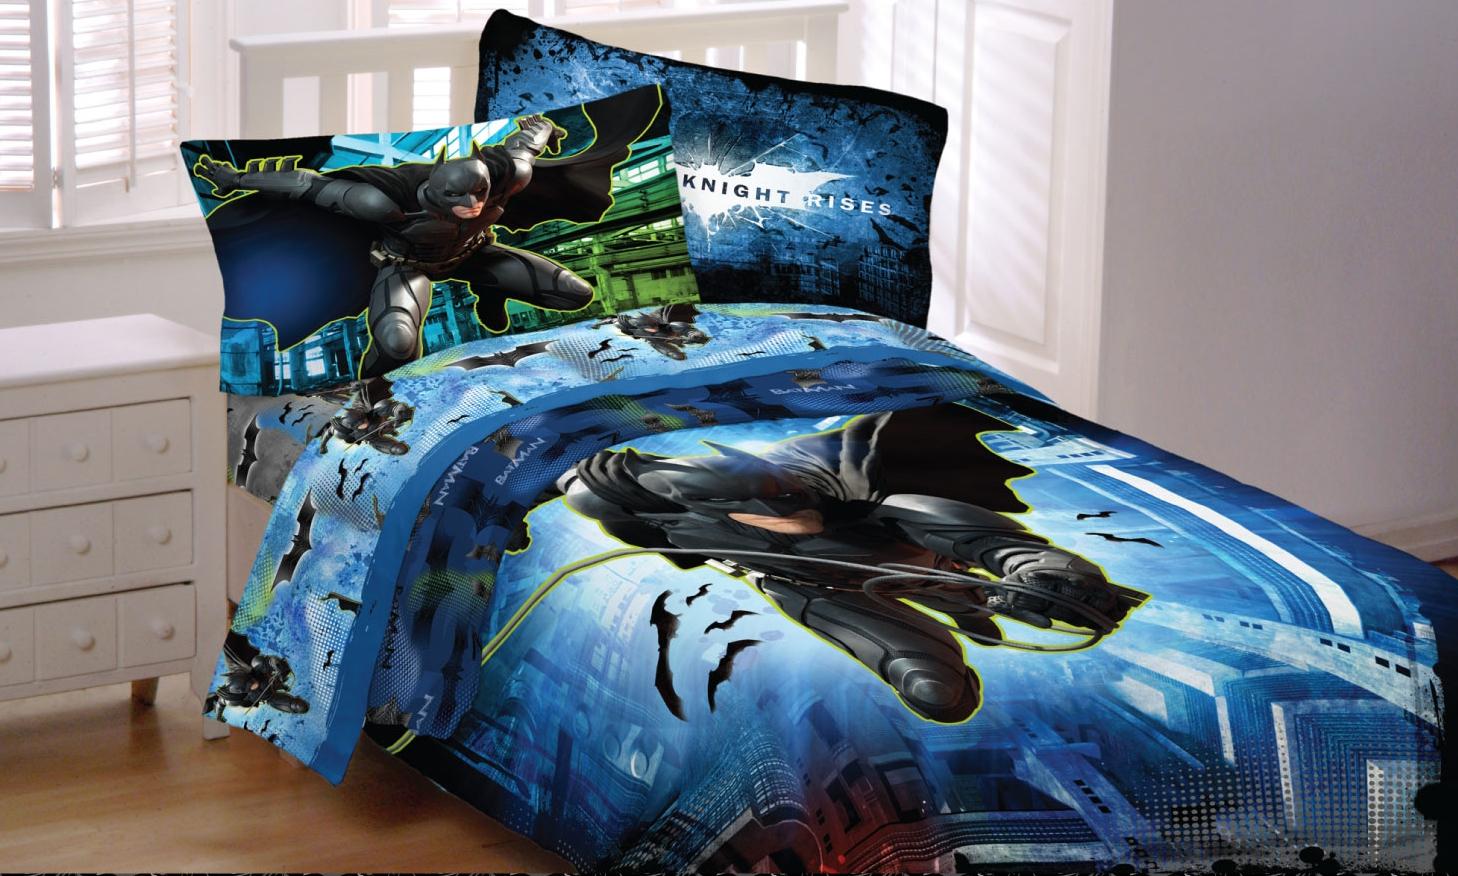 BATMAN Bedding (Image 1 of 10)